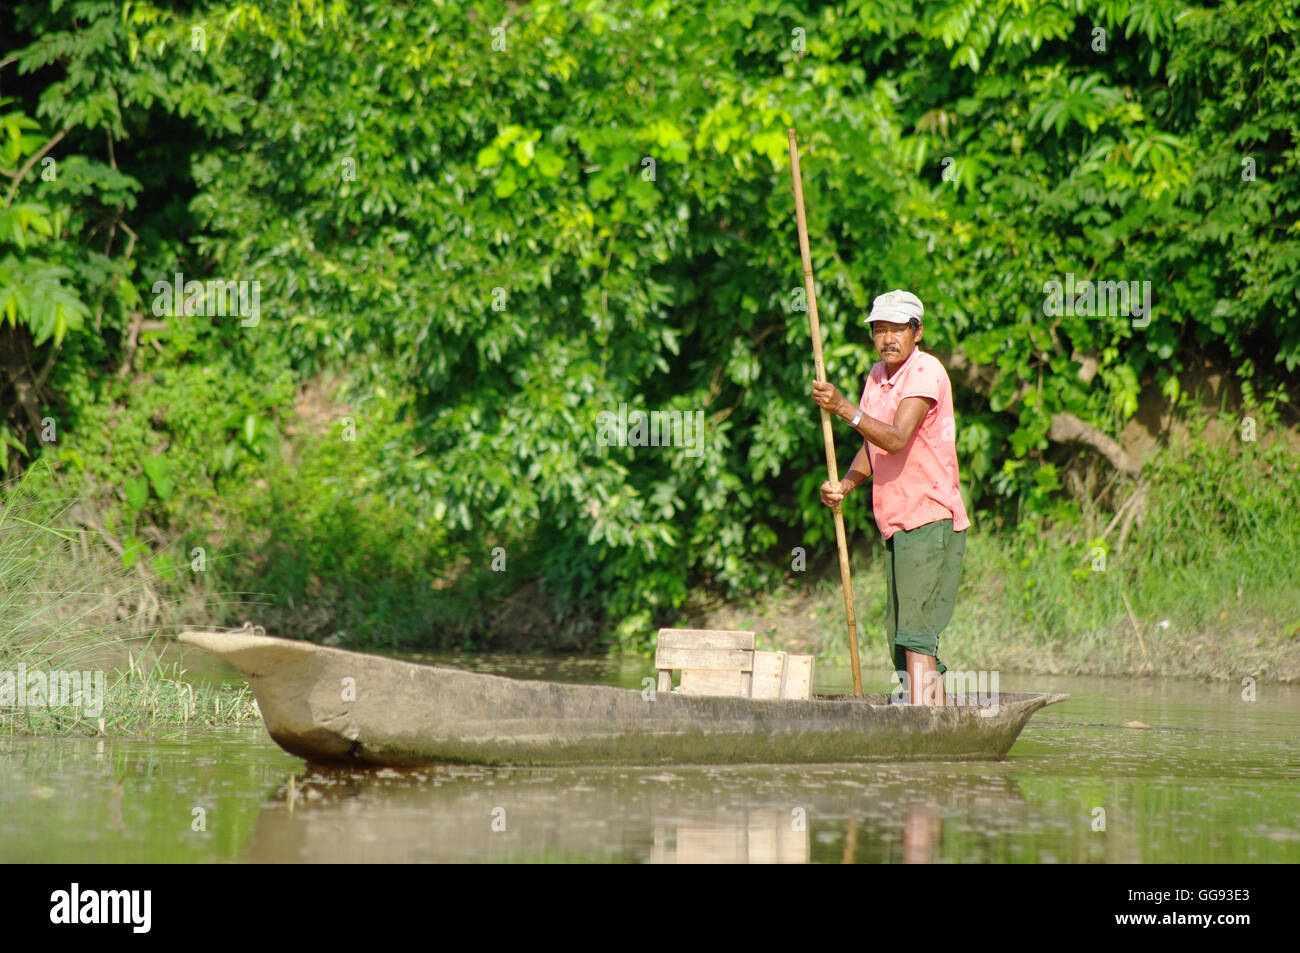 MANAUS, BR, CIRCA AUGUST 2011 - Man on a canoe on the Amazon river, circa August 2012 at Manaus, BR. - Stock Image